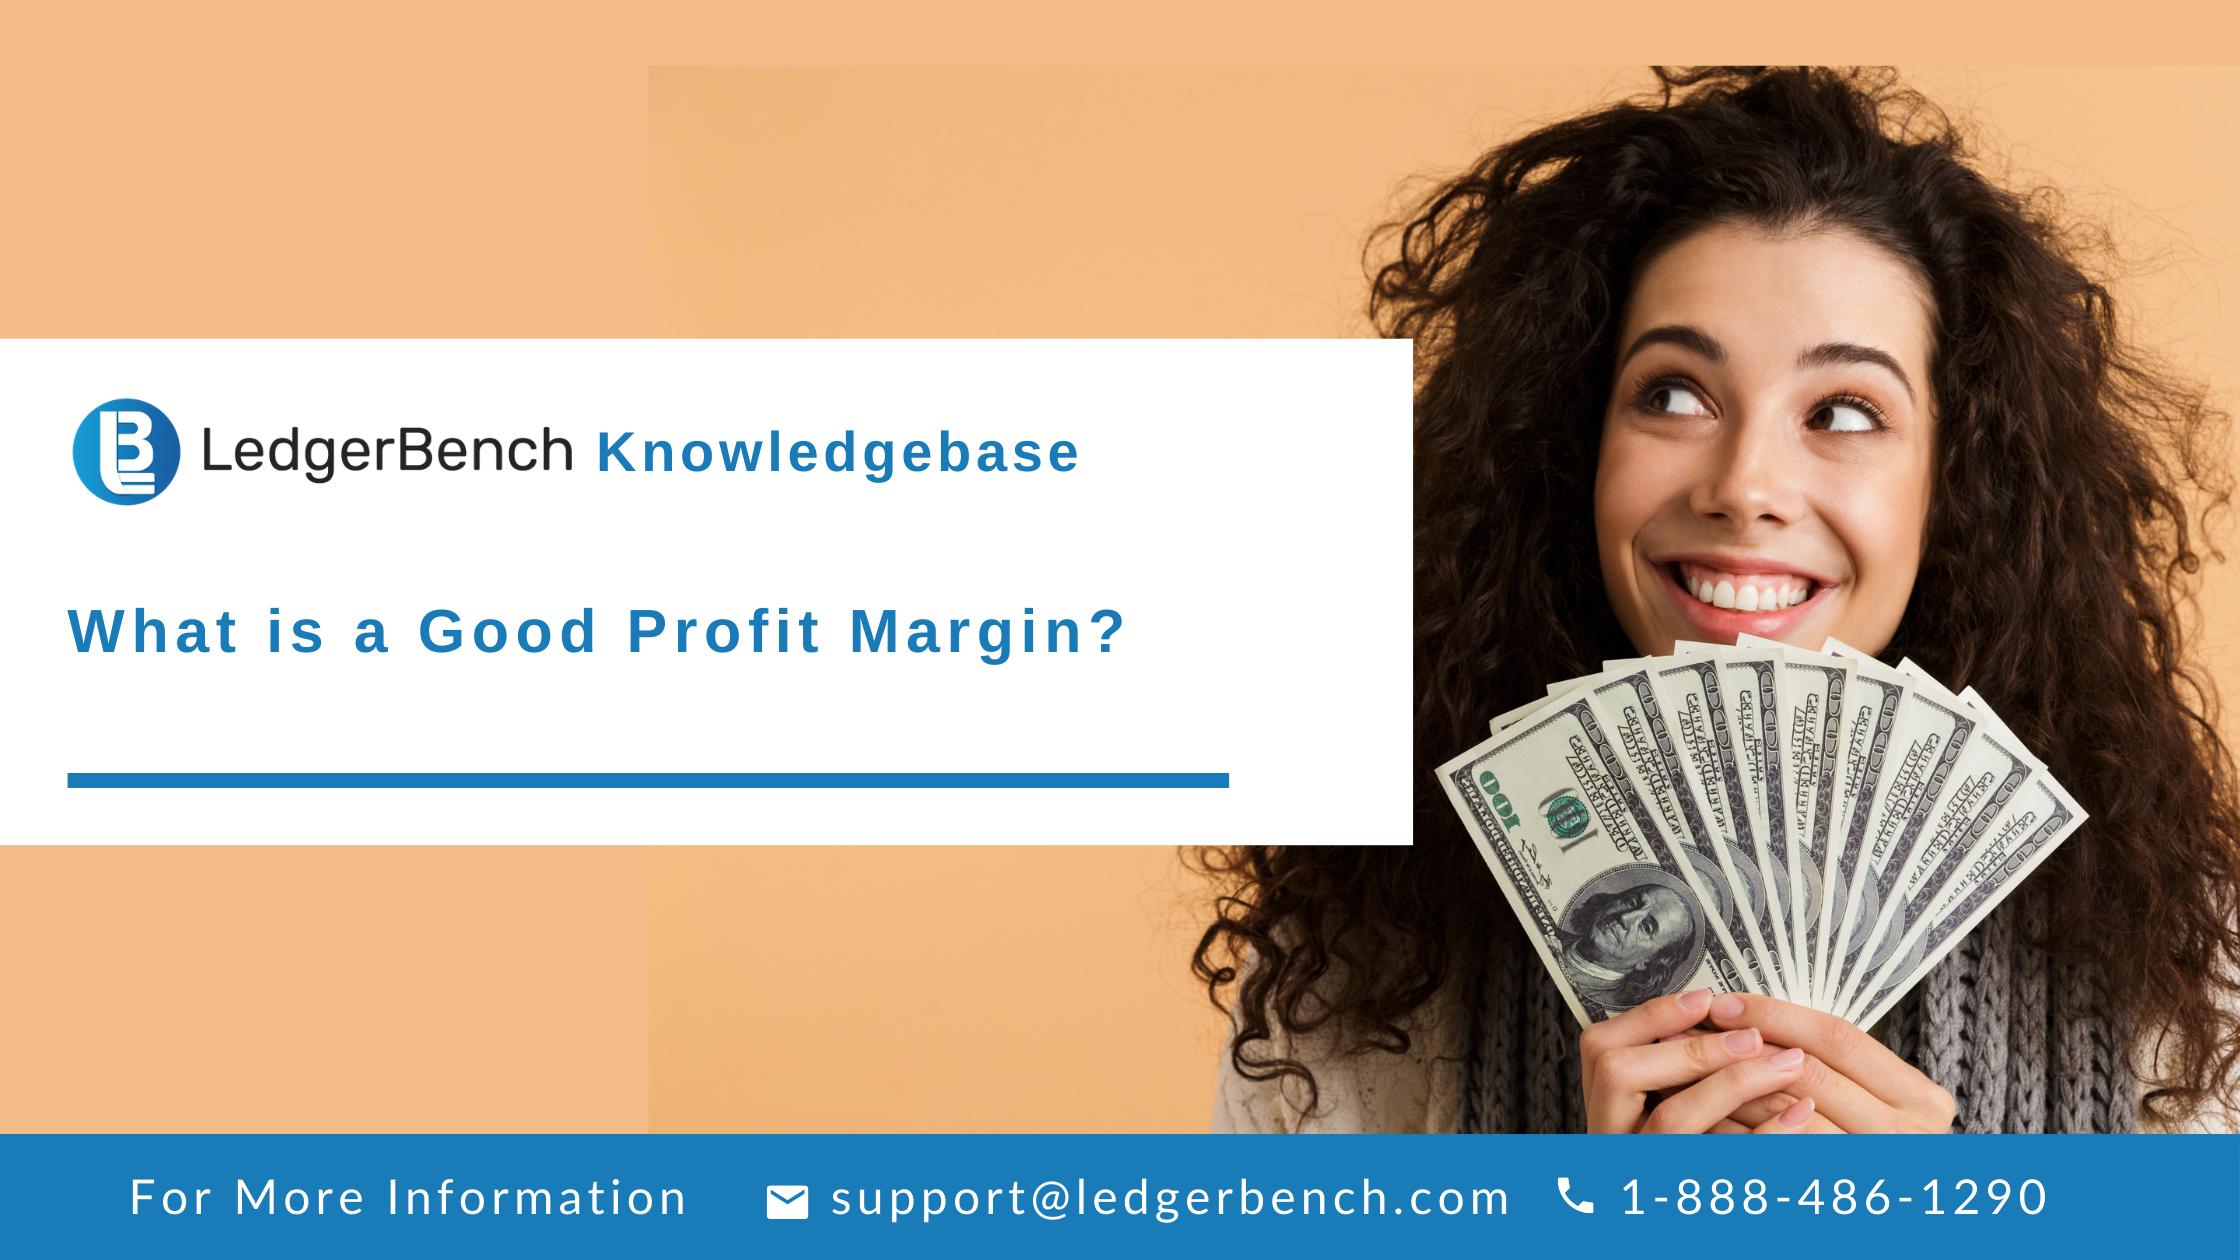 What is a Good Profit Margin